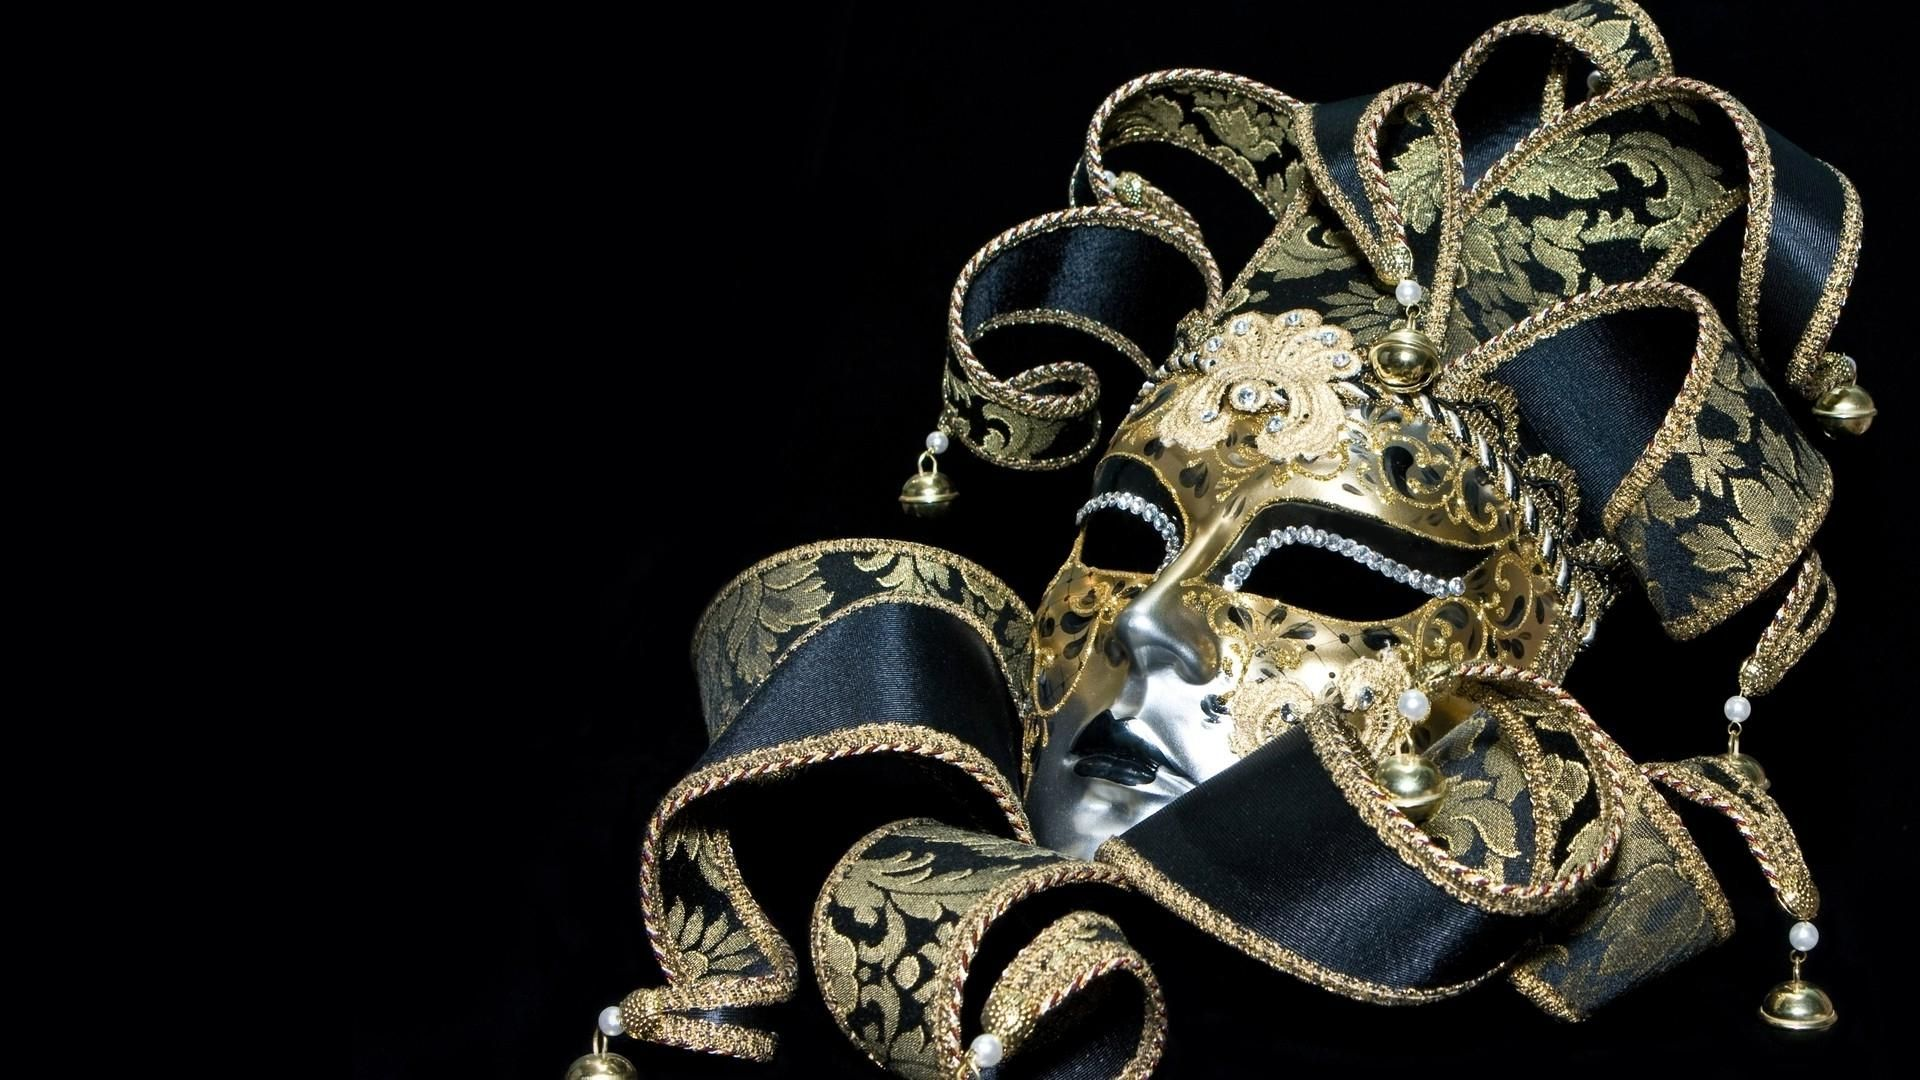 masquerade mask black background wallpaper - photo #4